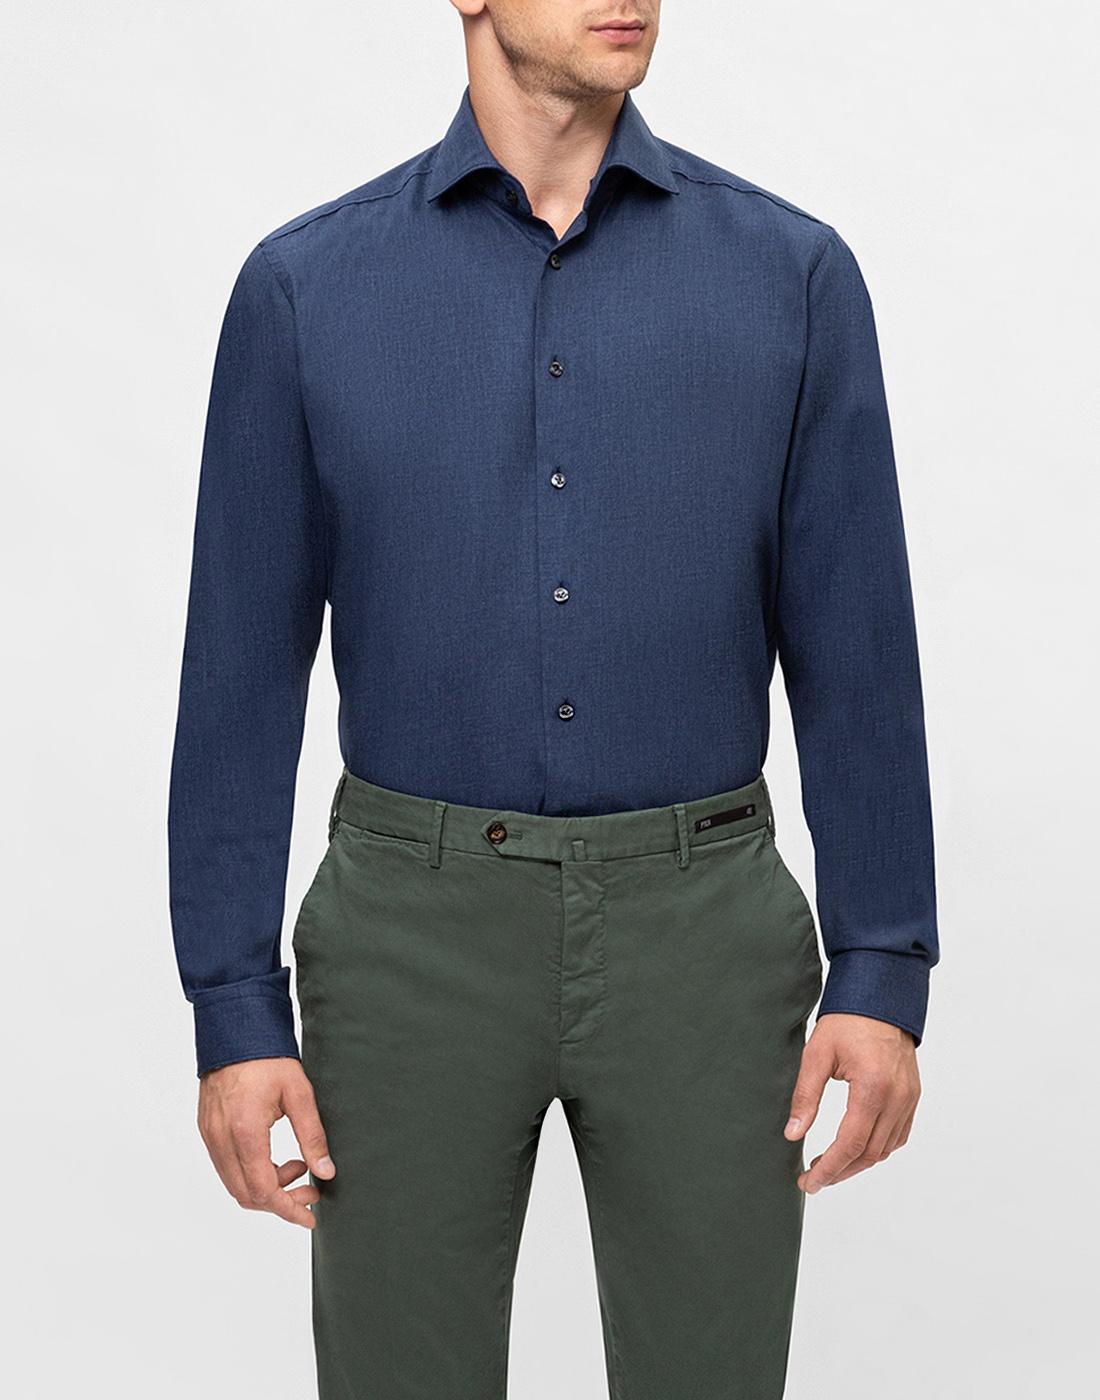 Мужская темно-синяя рубашка Van Laack S155026/780-2